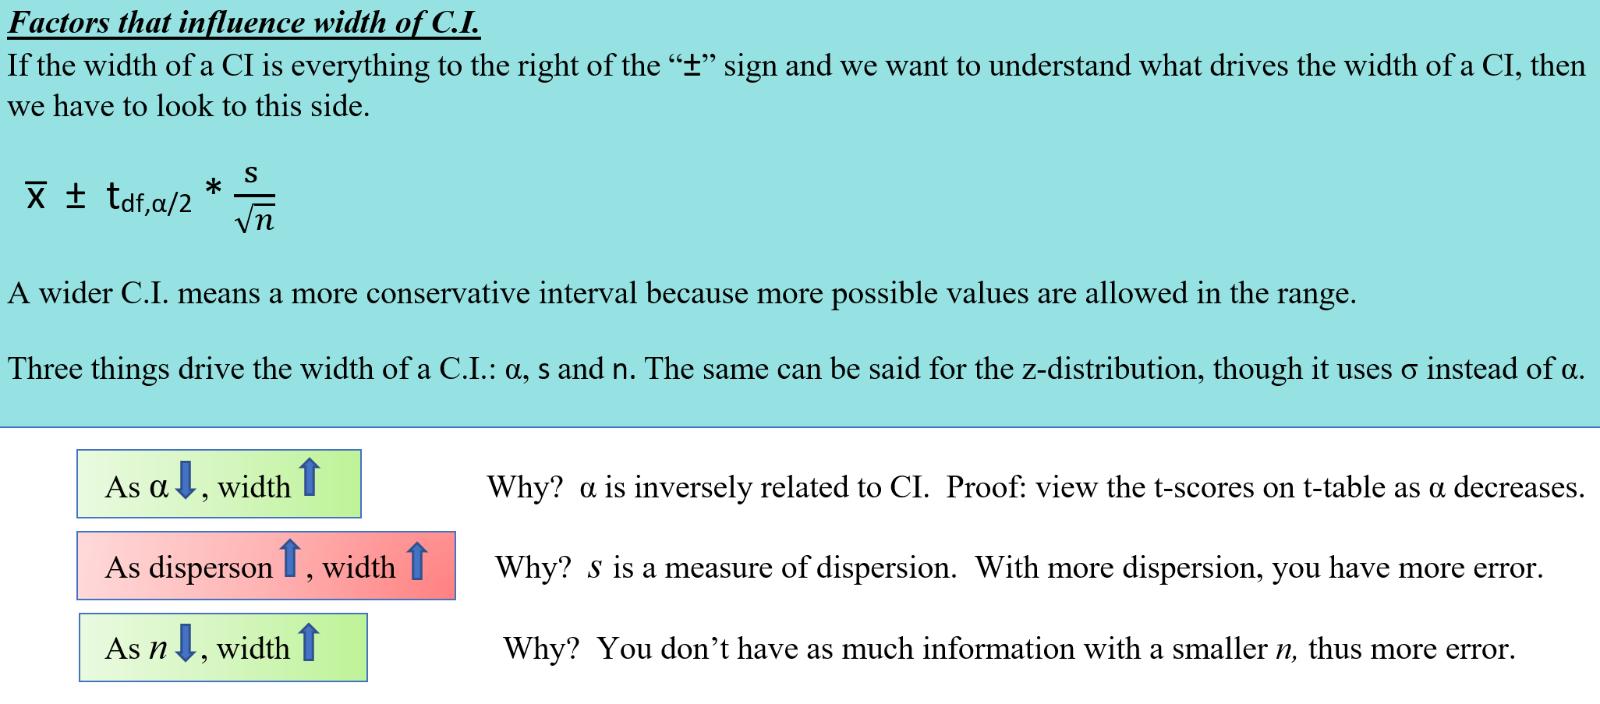 Factors that influence width